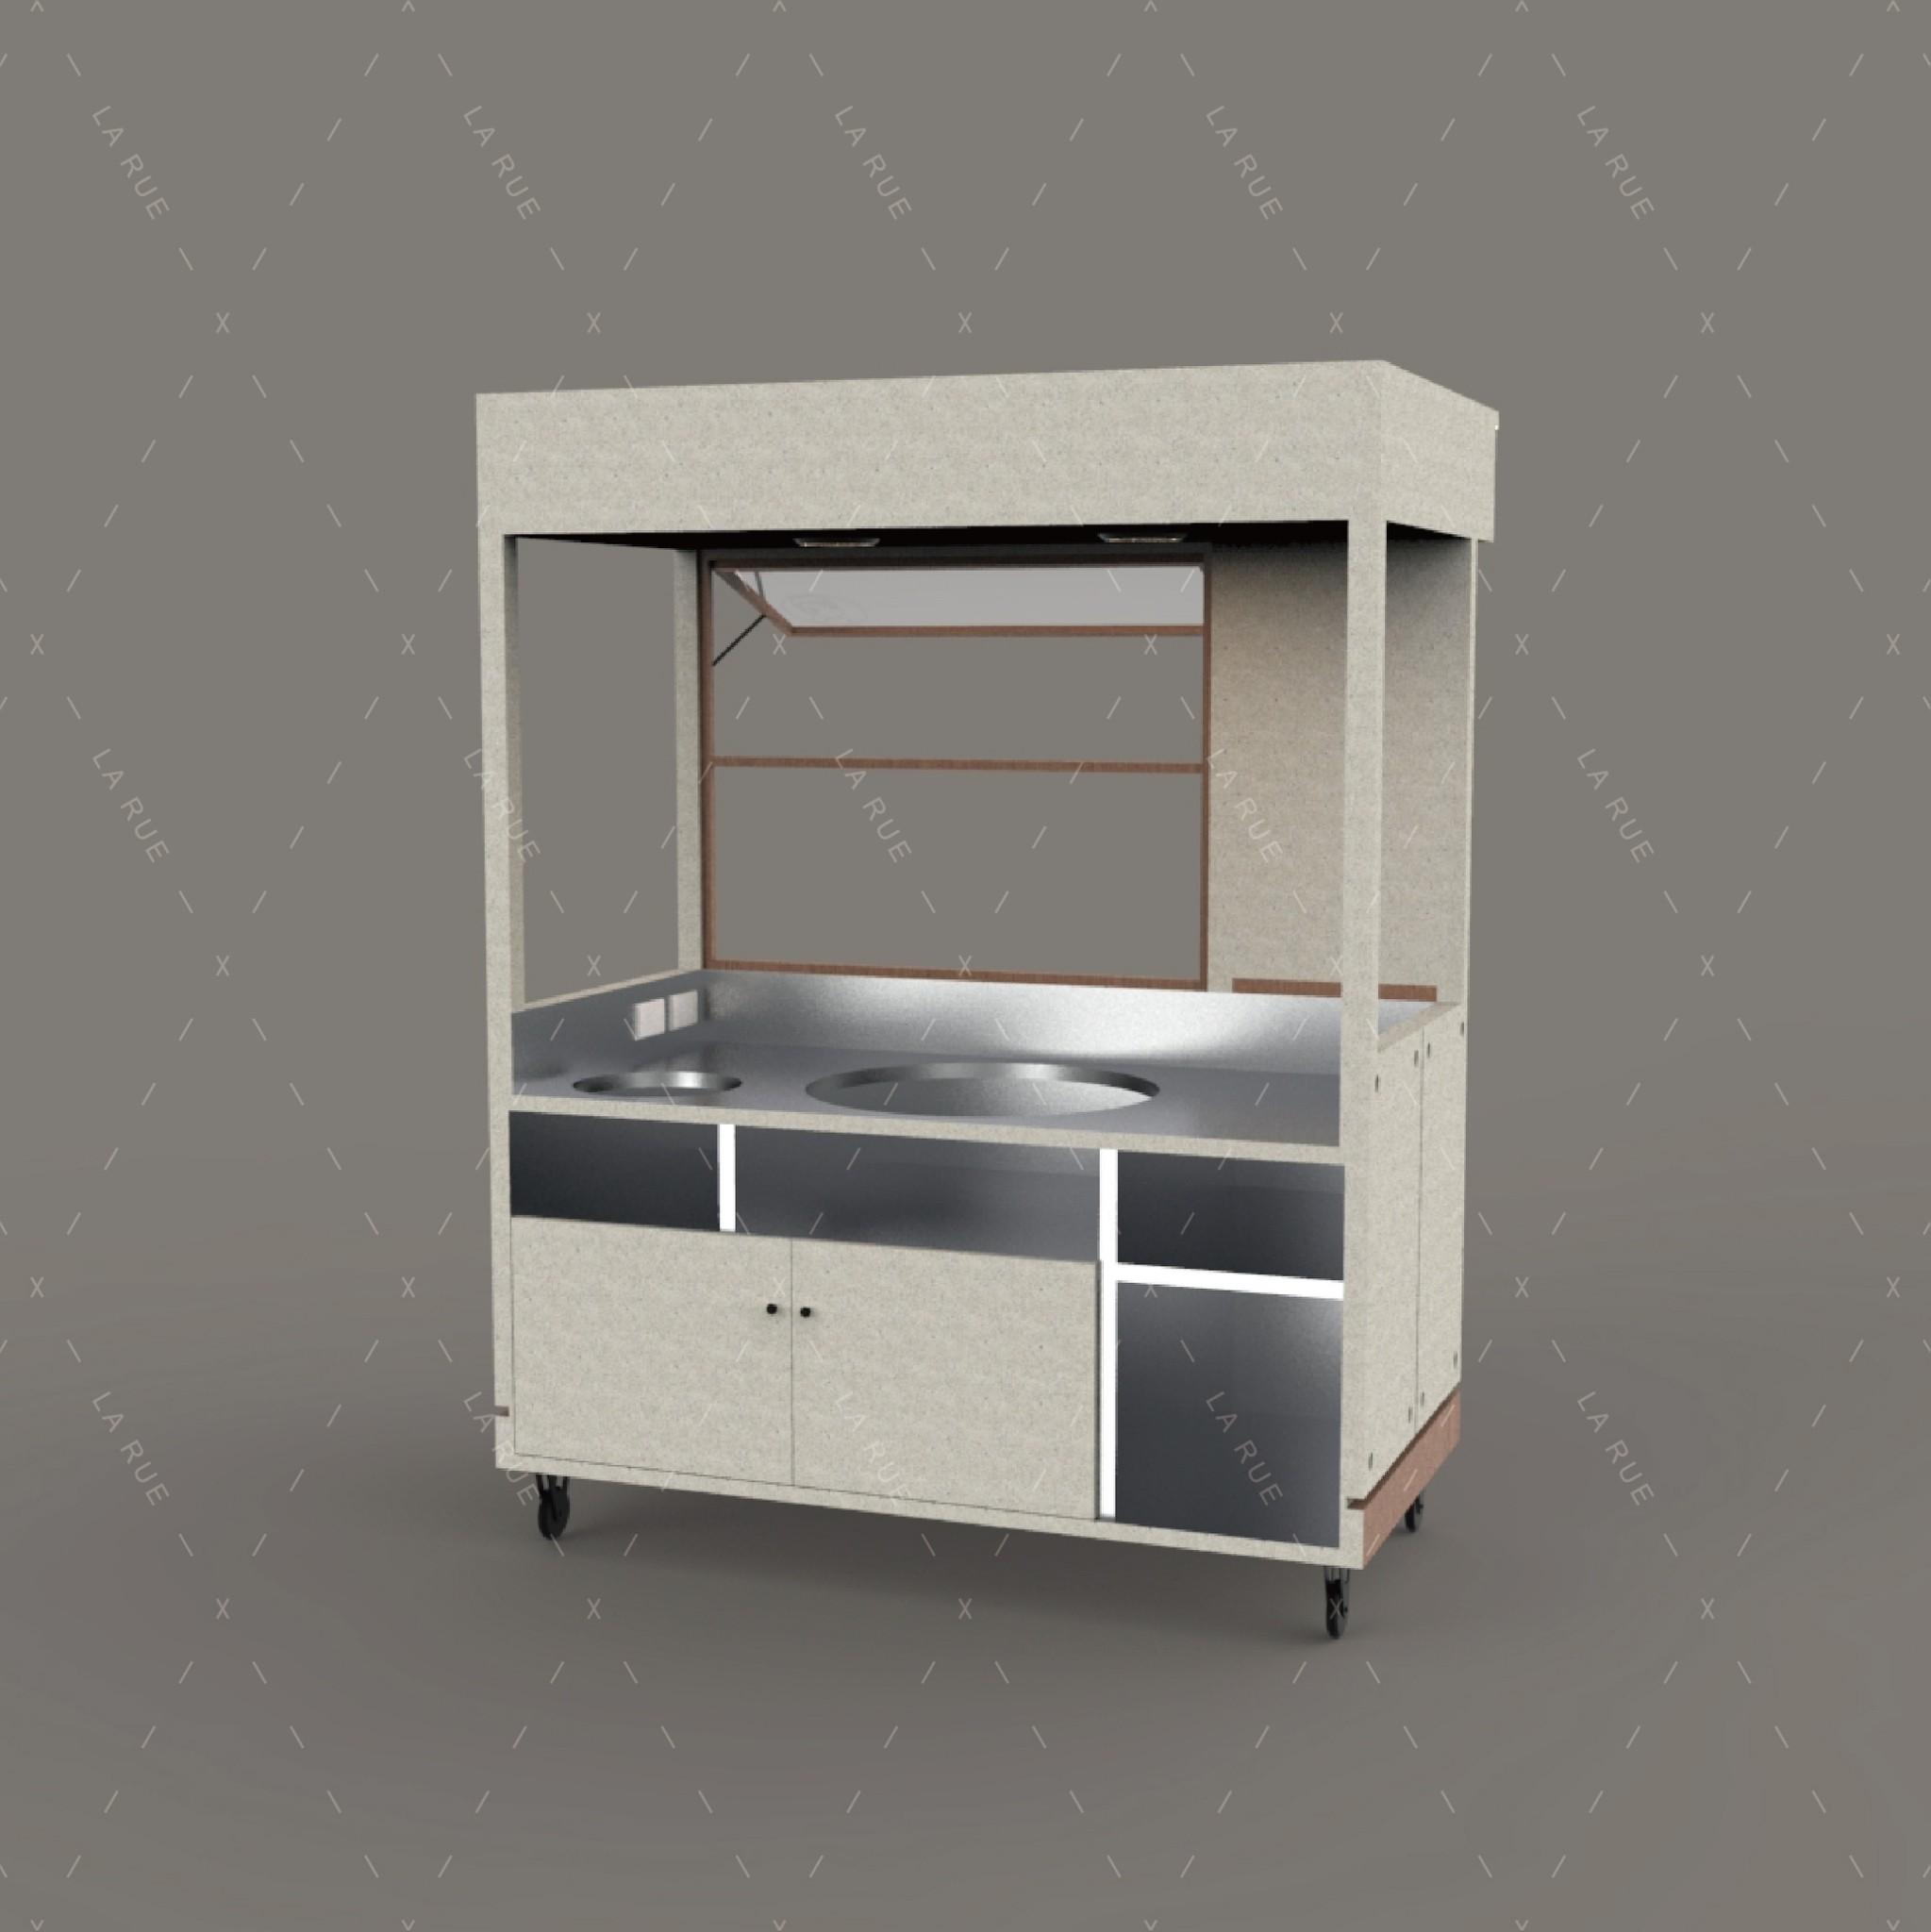 浮水印餐車_210615_64